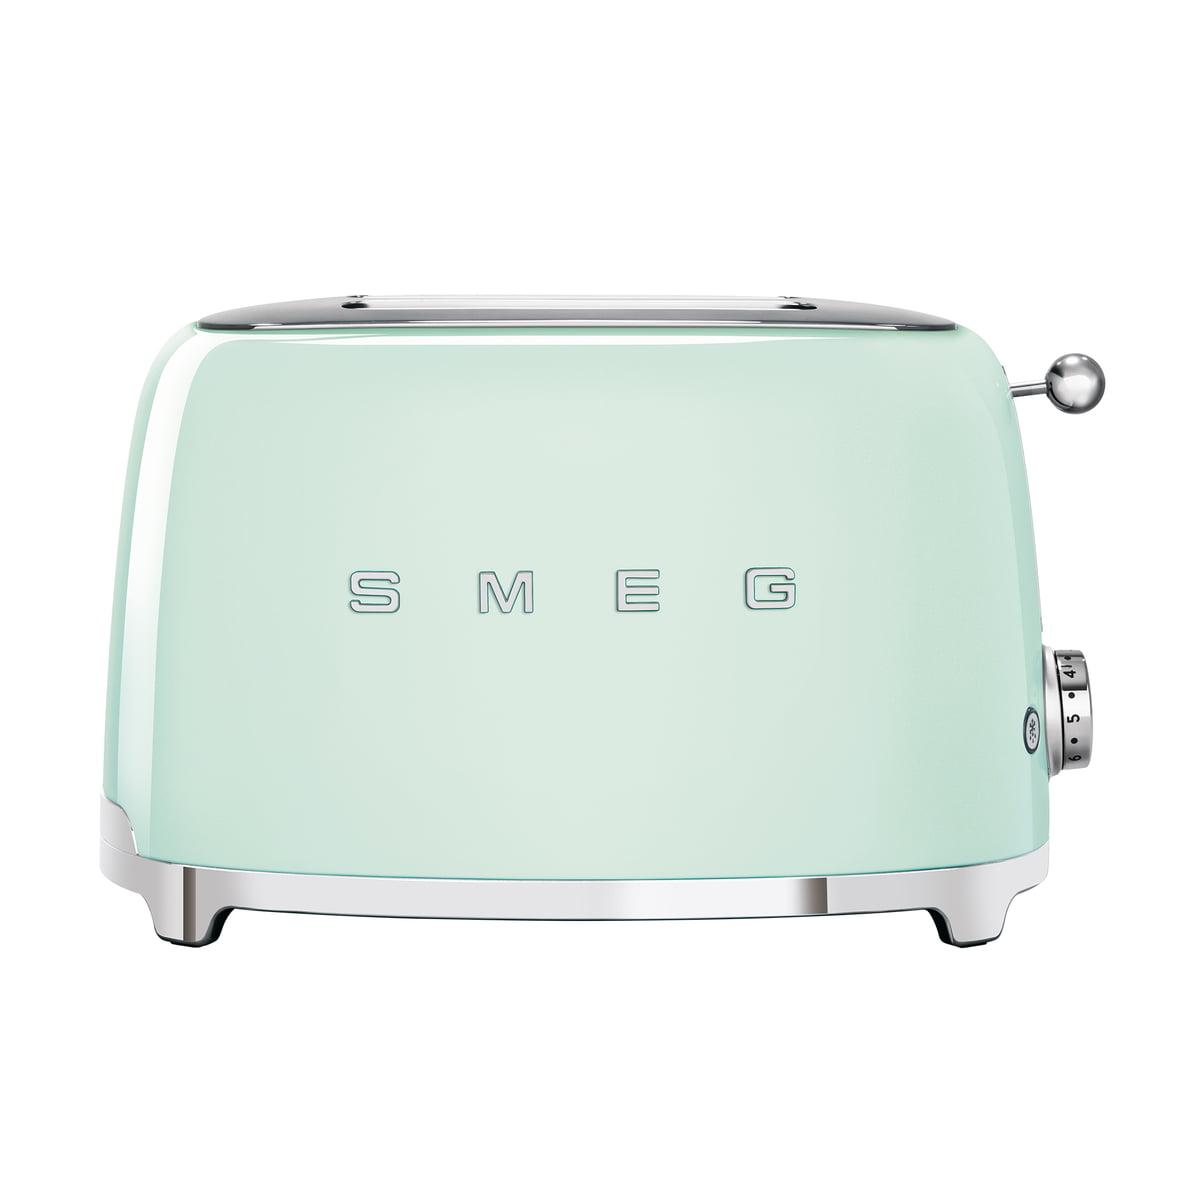 SMEG - 2-Scheiben ToasterTSF01, pastellgrün